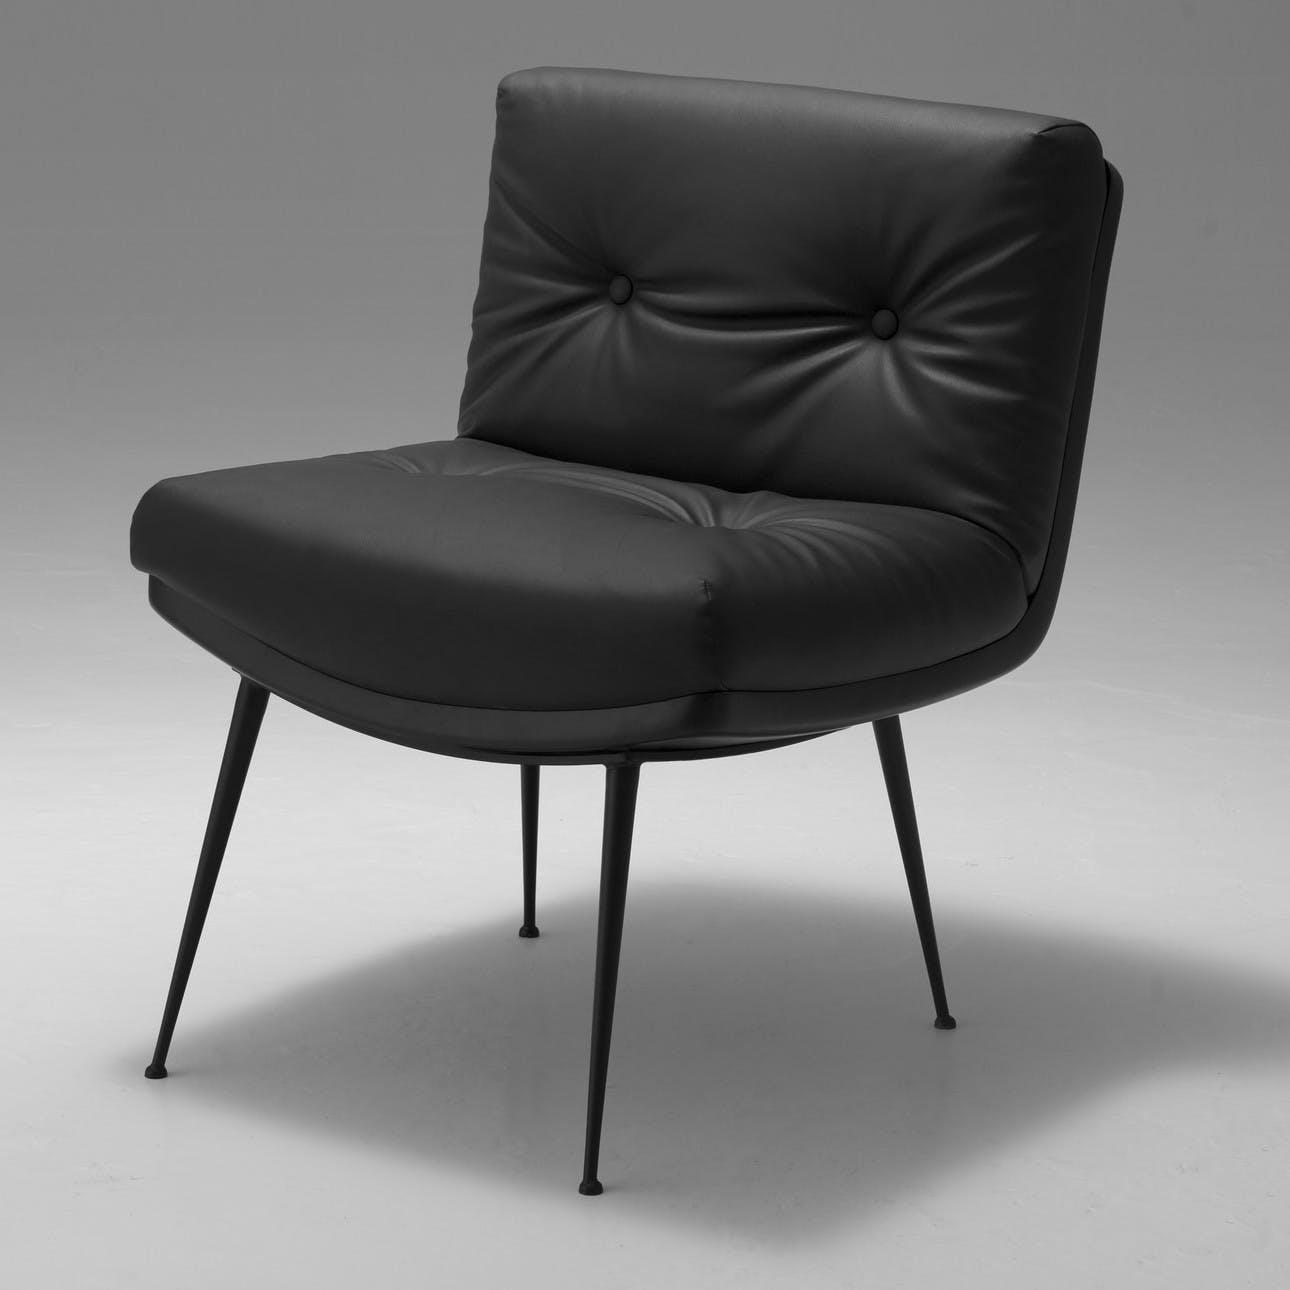 Chris Chair 2 Imperfetto Lab Haute Living